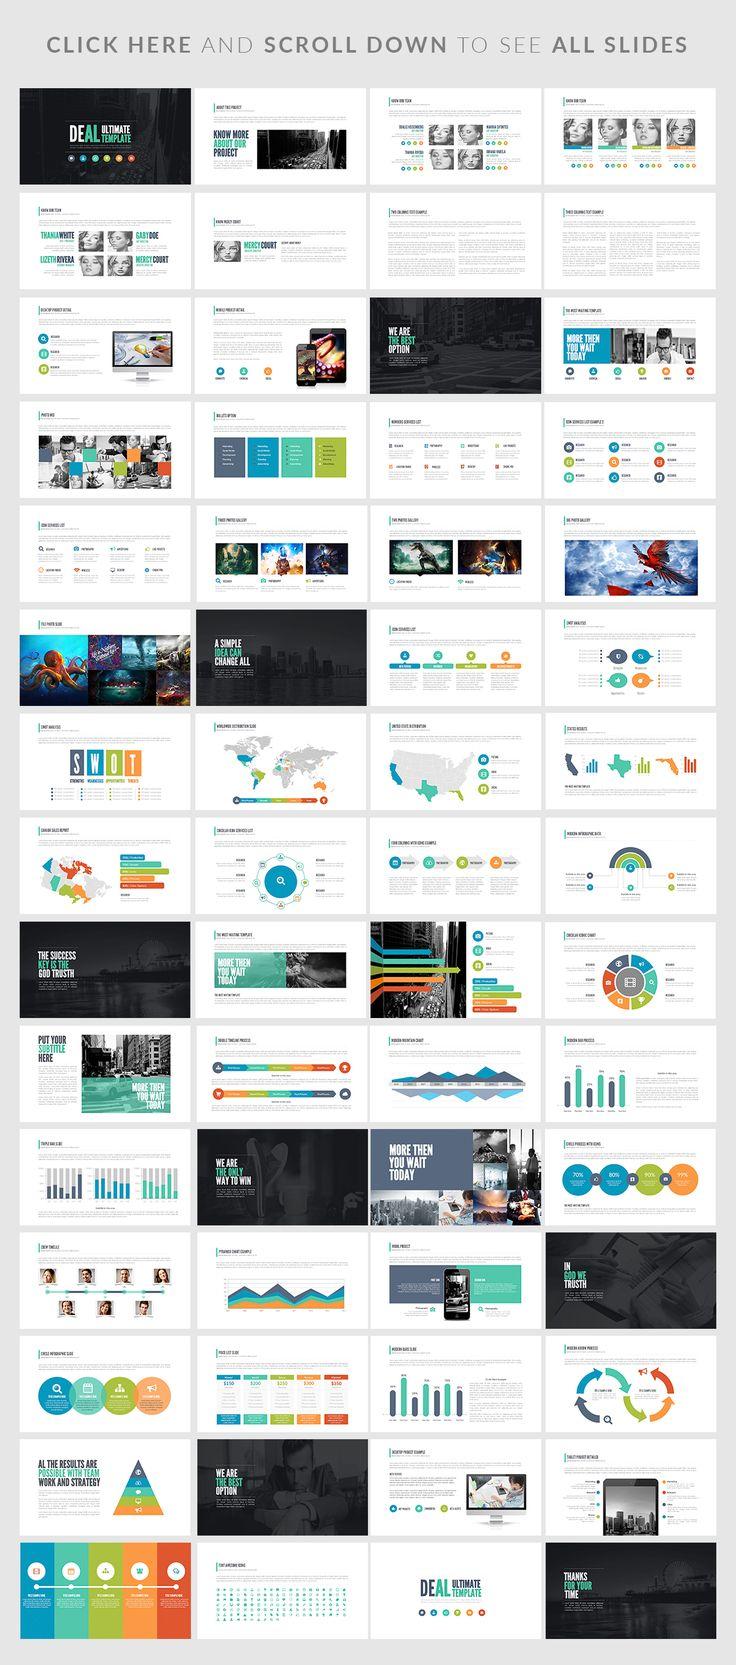 Deal   Powerpoint Presentation by Zacomic Studios on Creative Market